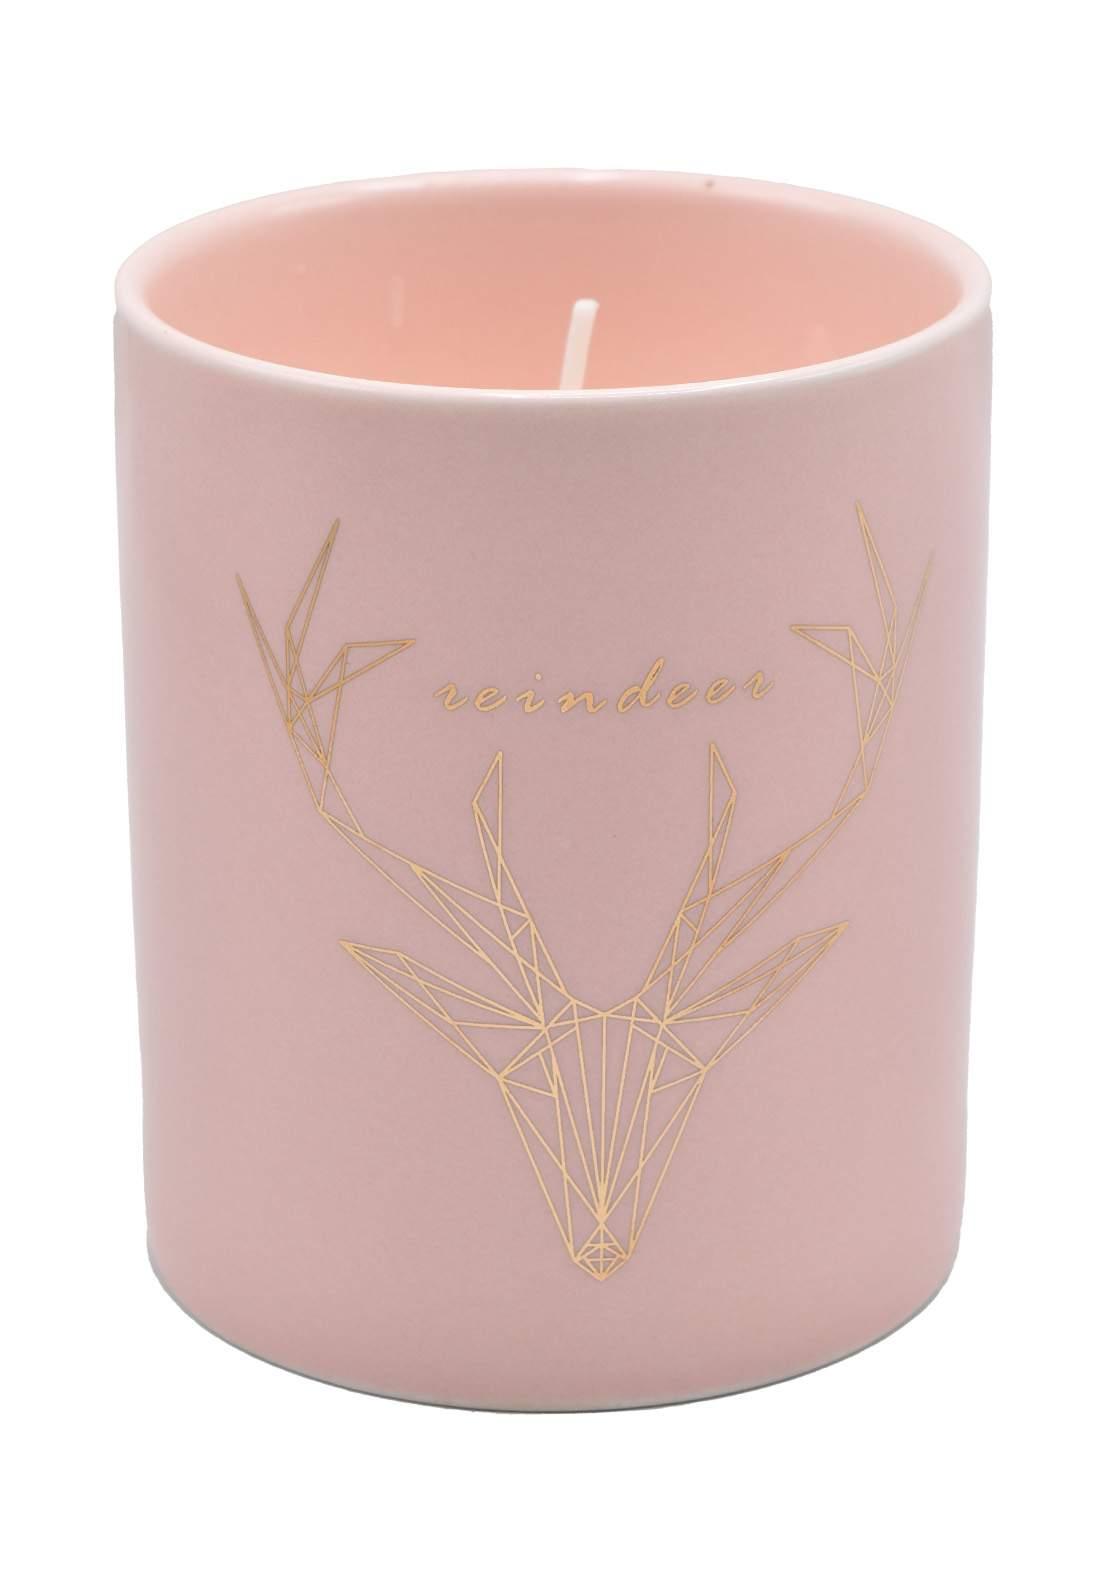 Scented Candle شمعة عطرية الكريمة